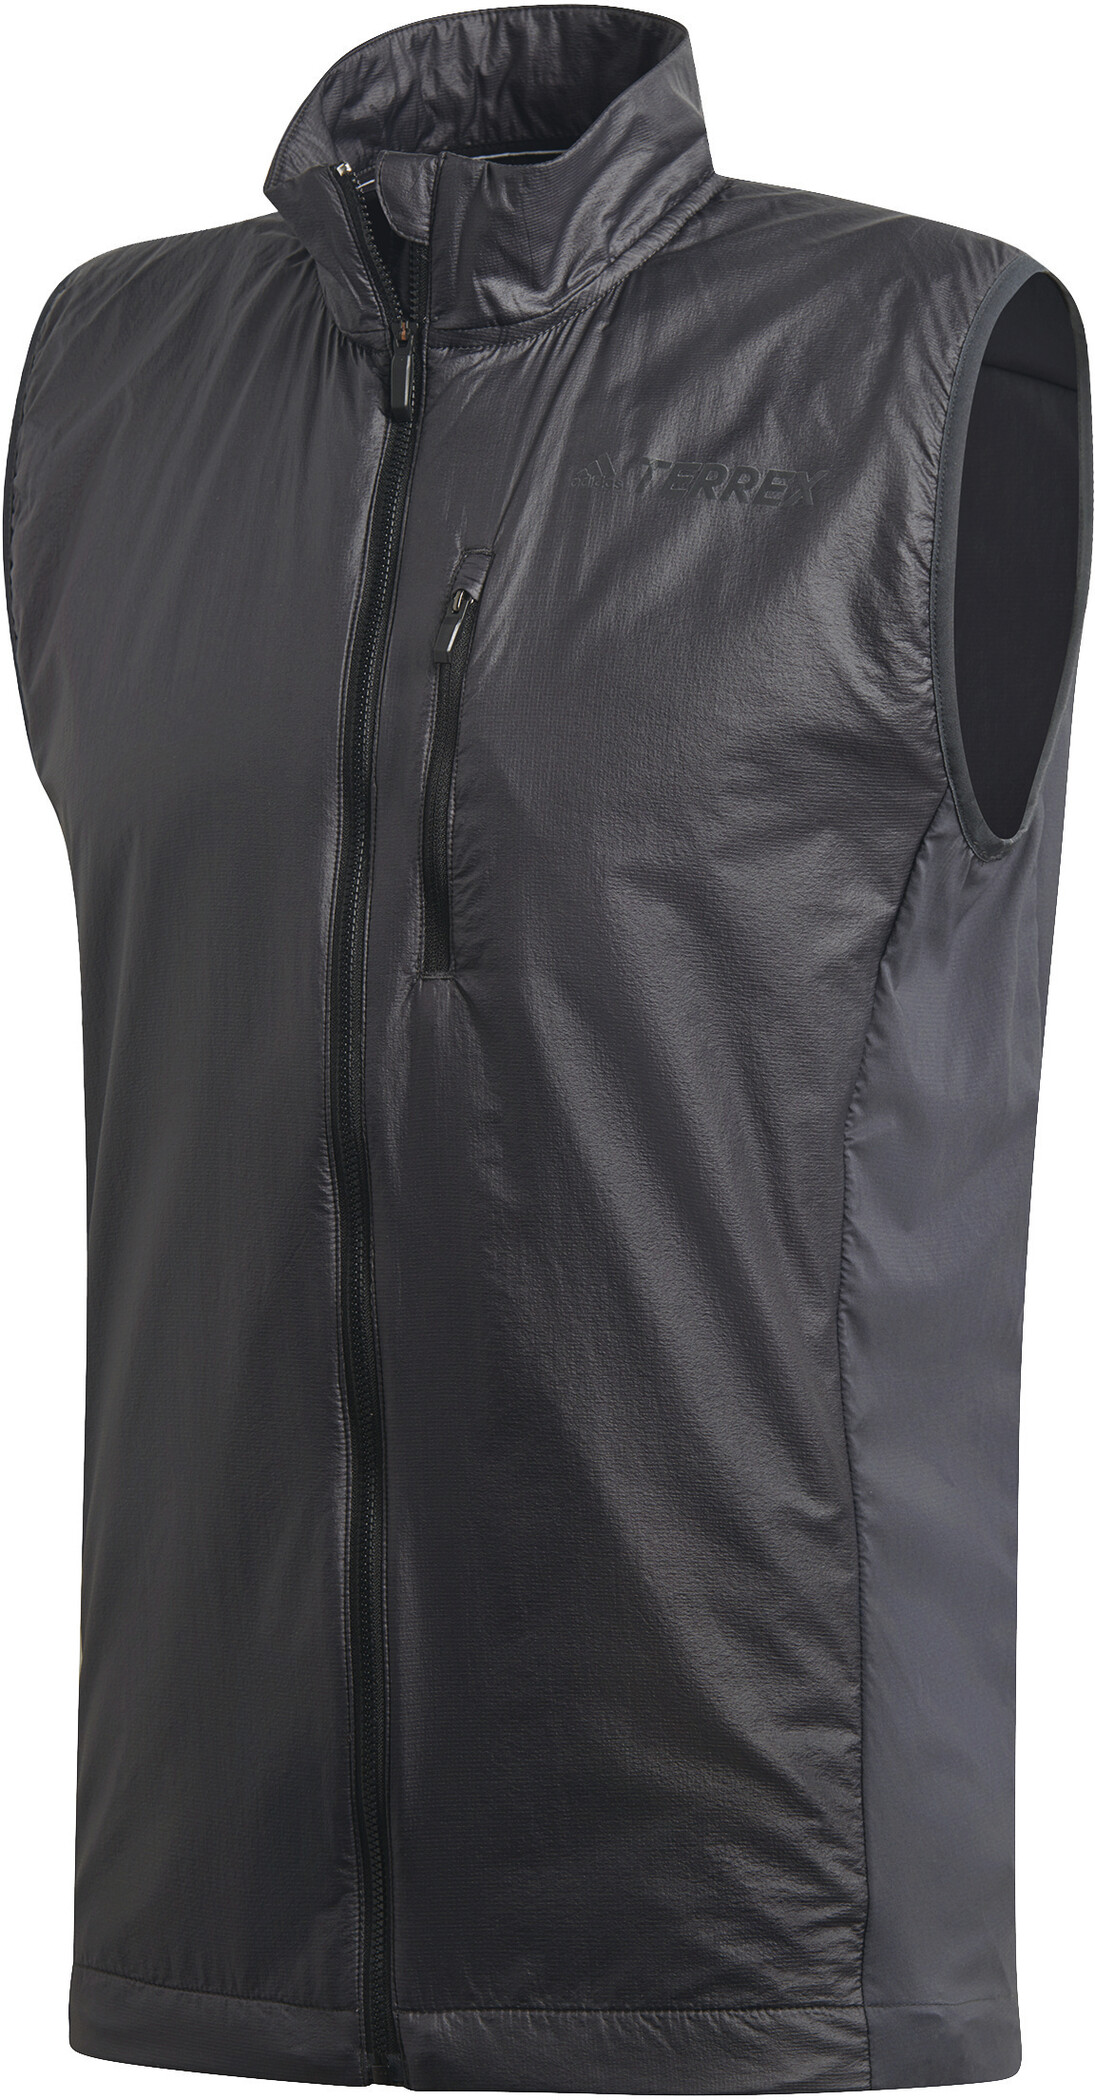 adidas Terrex Agravic Vest (Large)   Veste